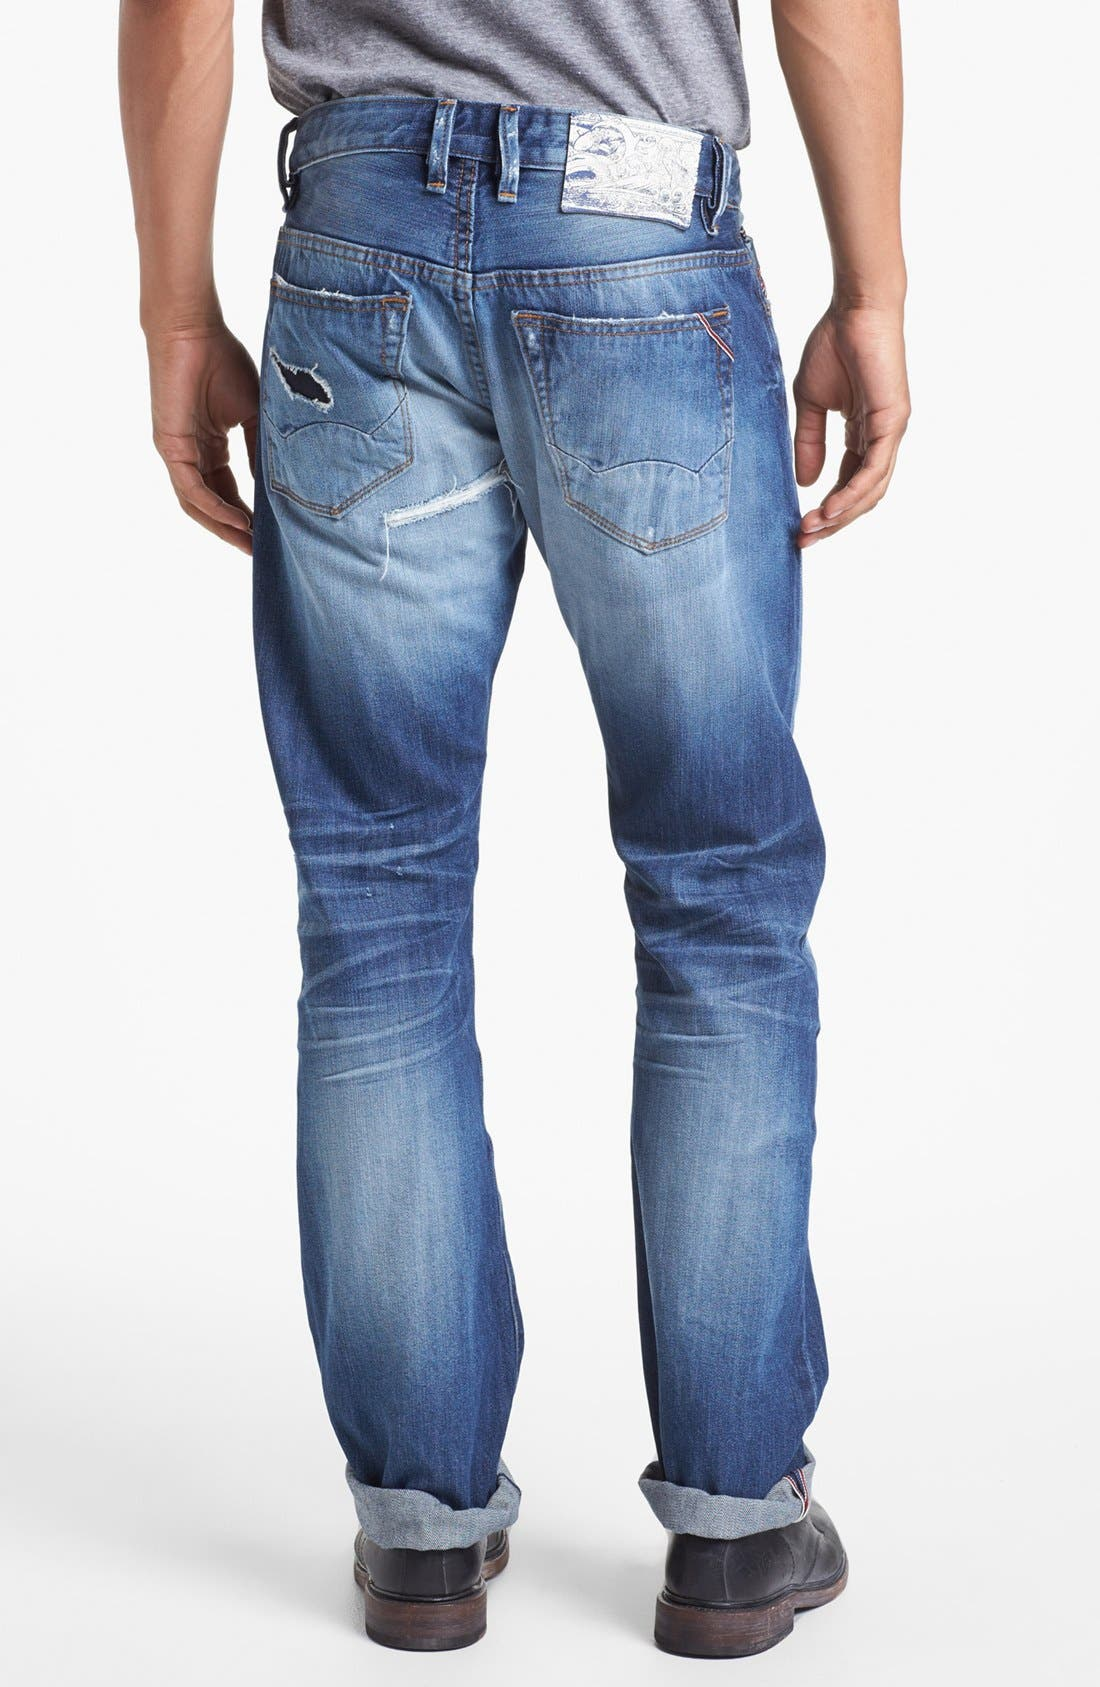 Alternate Image 1 Selected - Cult of Individuality 'Rebel' Straight Leg Selvedge Jeans (Riverside)